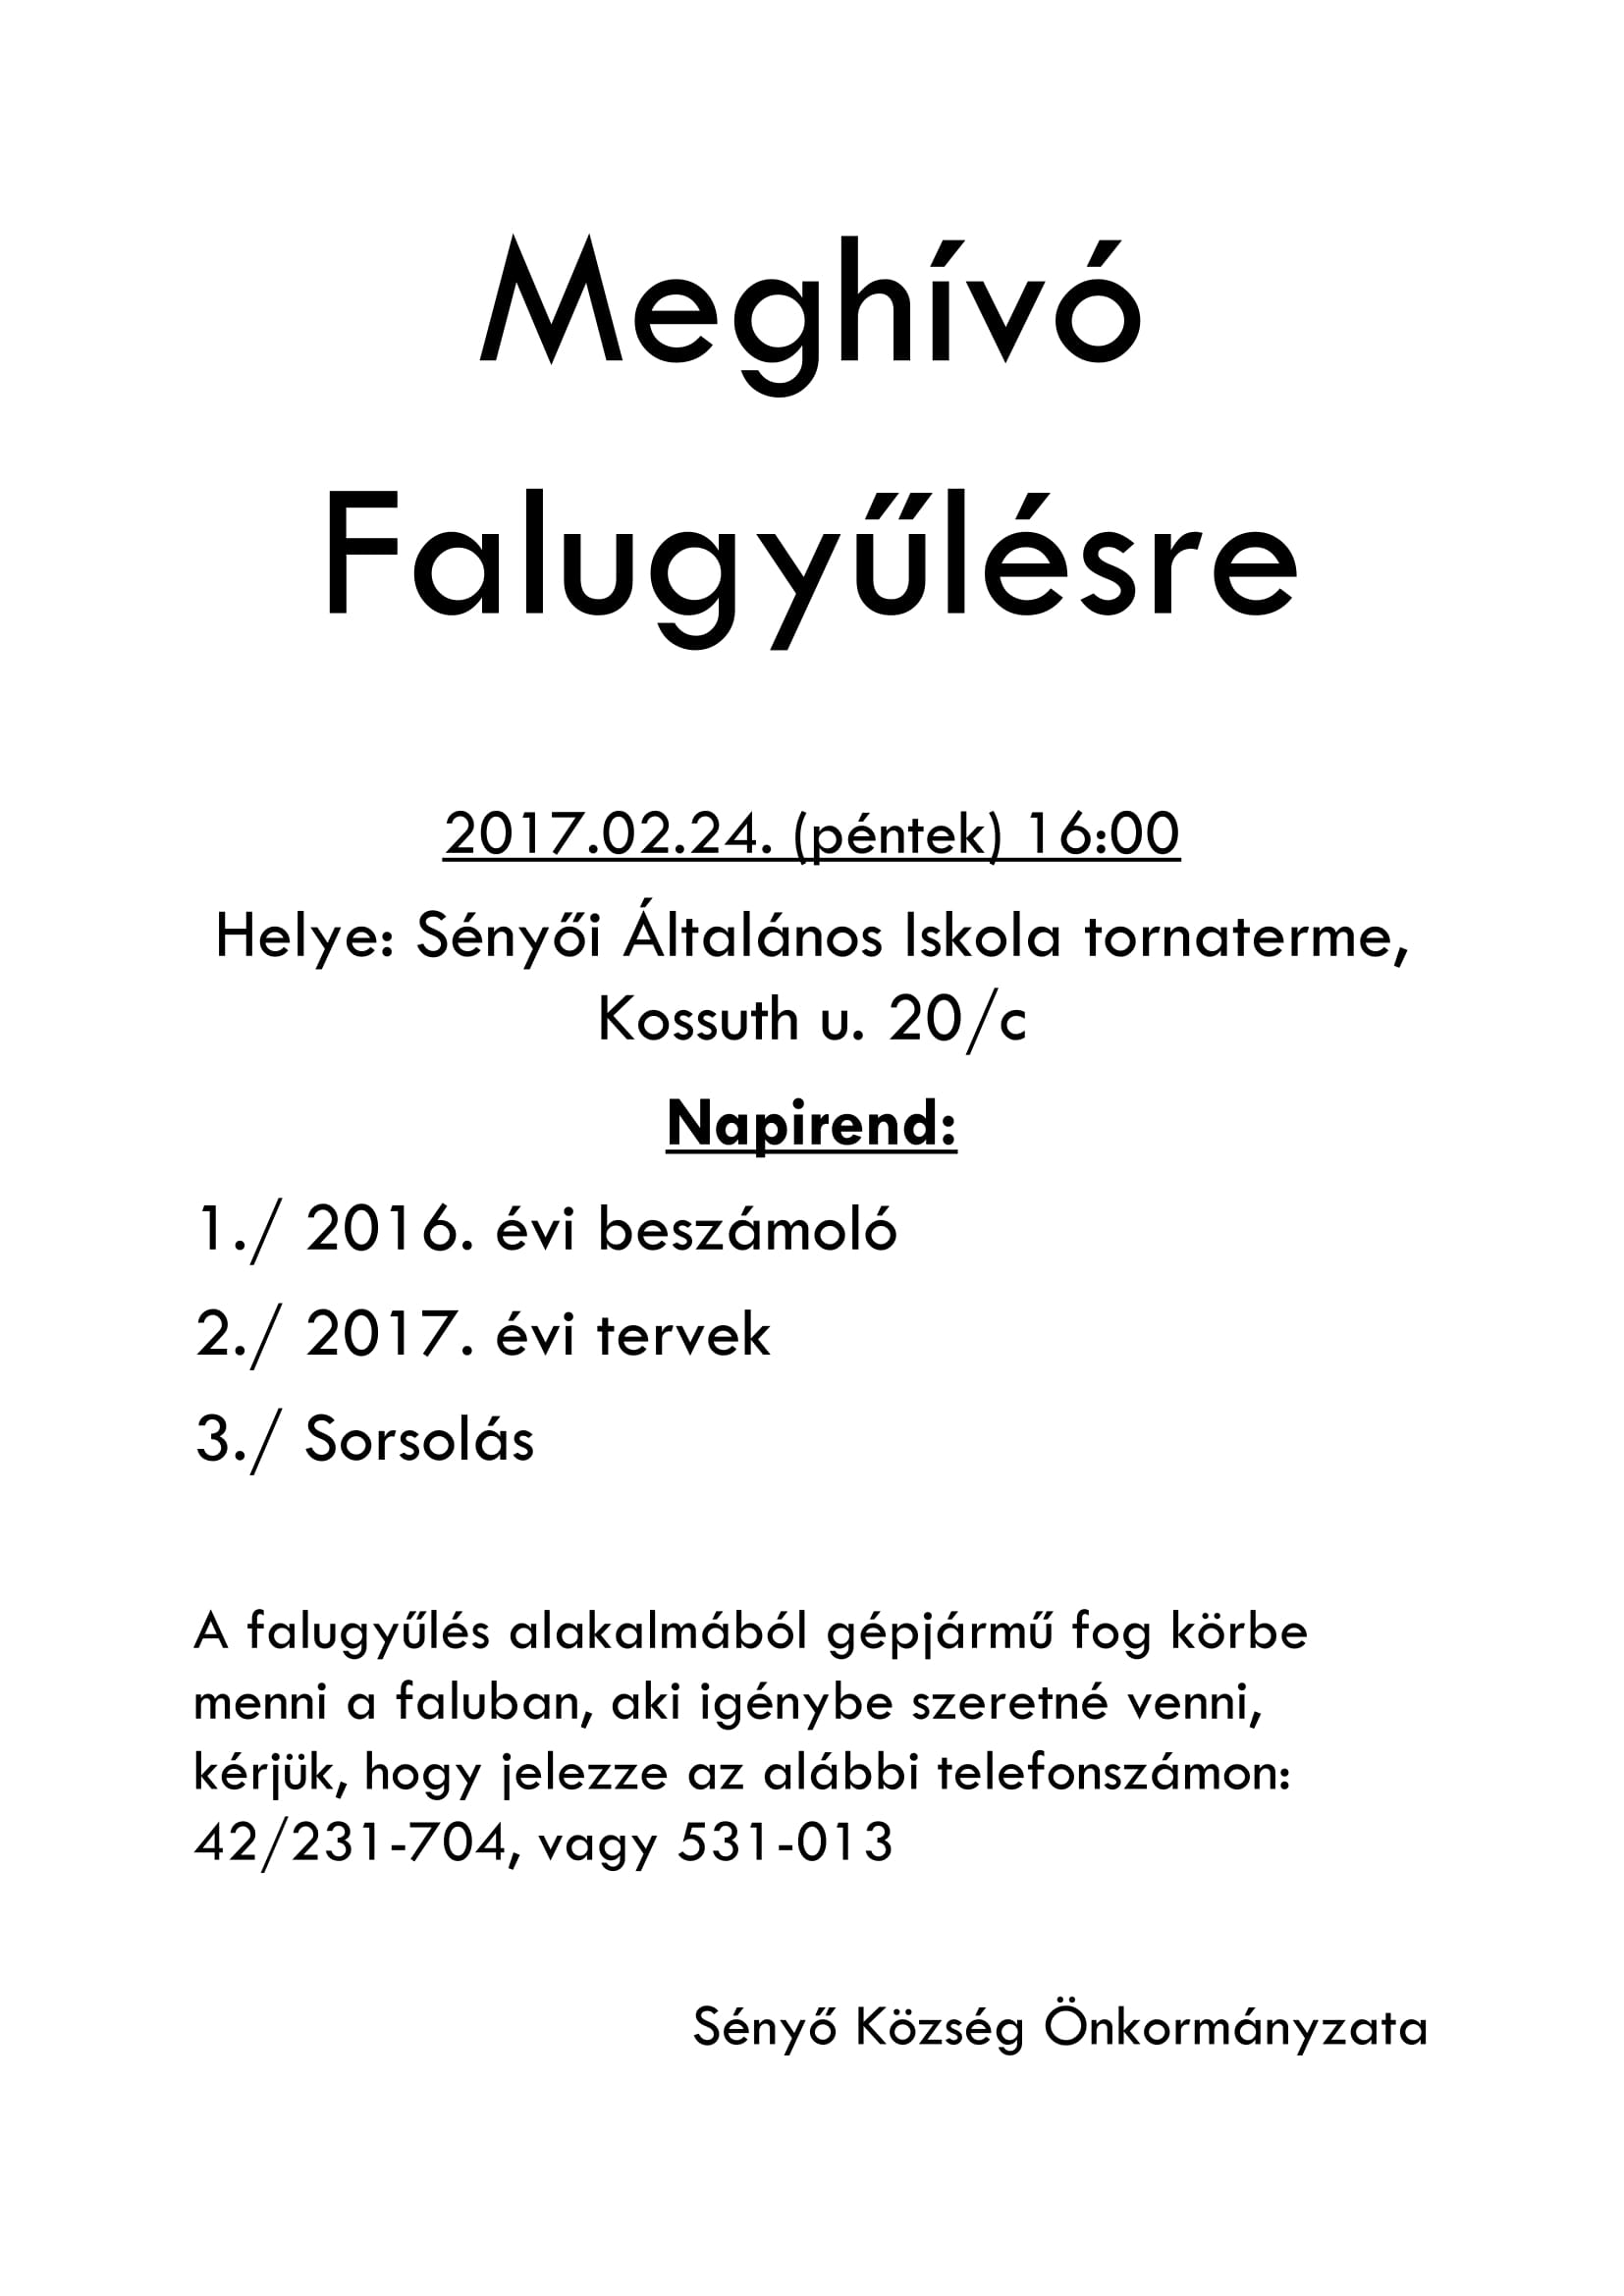 meghivo-falugyules-2017-02-24